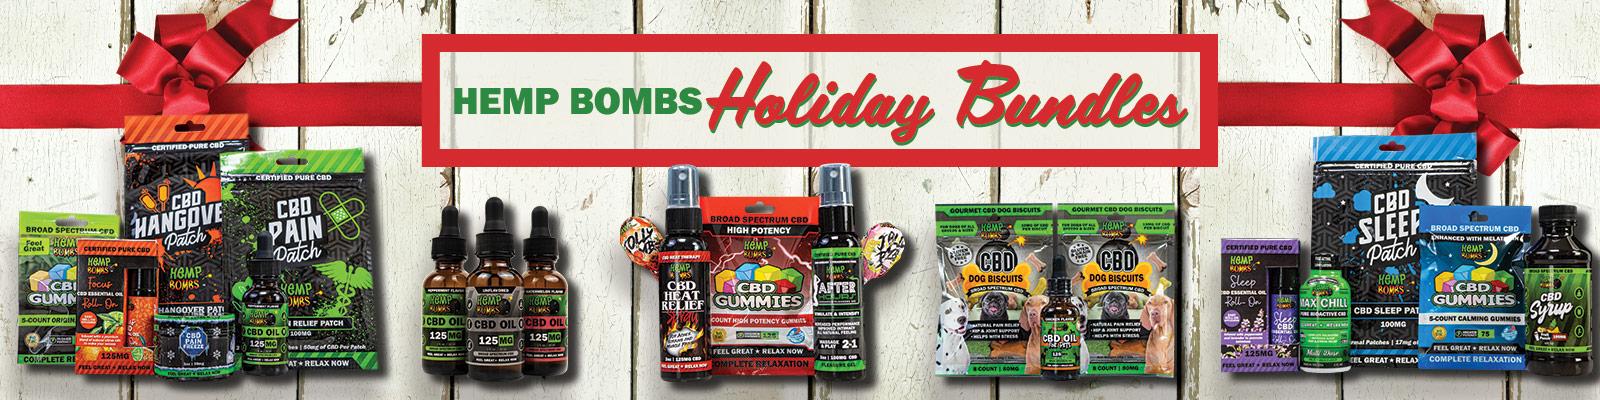 Hemp Bombs Holiday Bundles